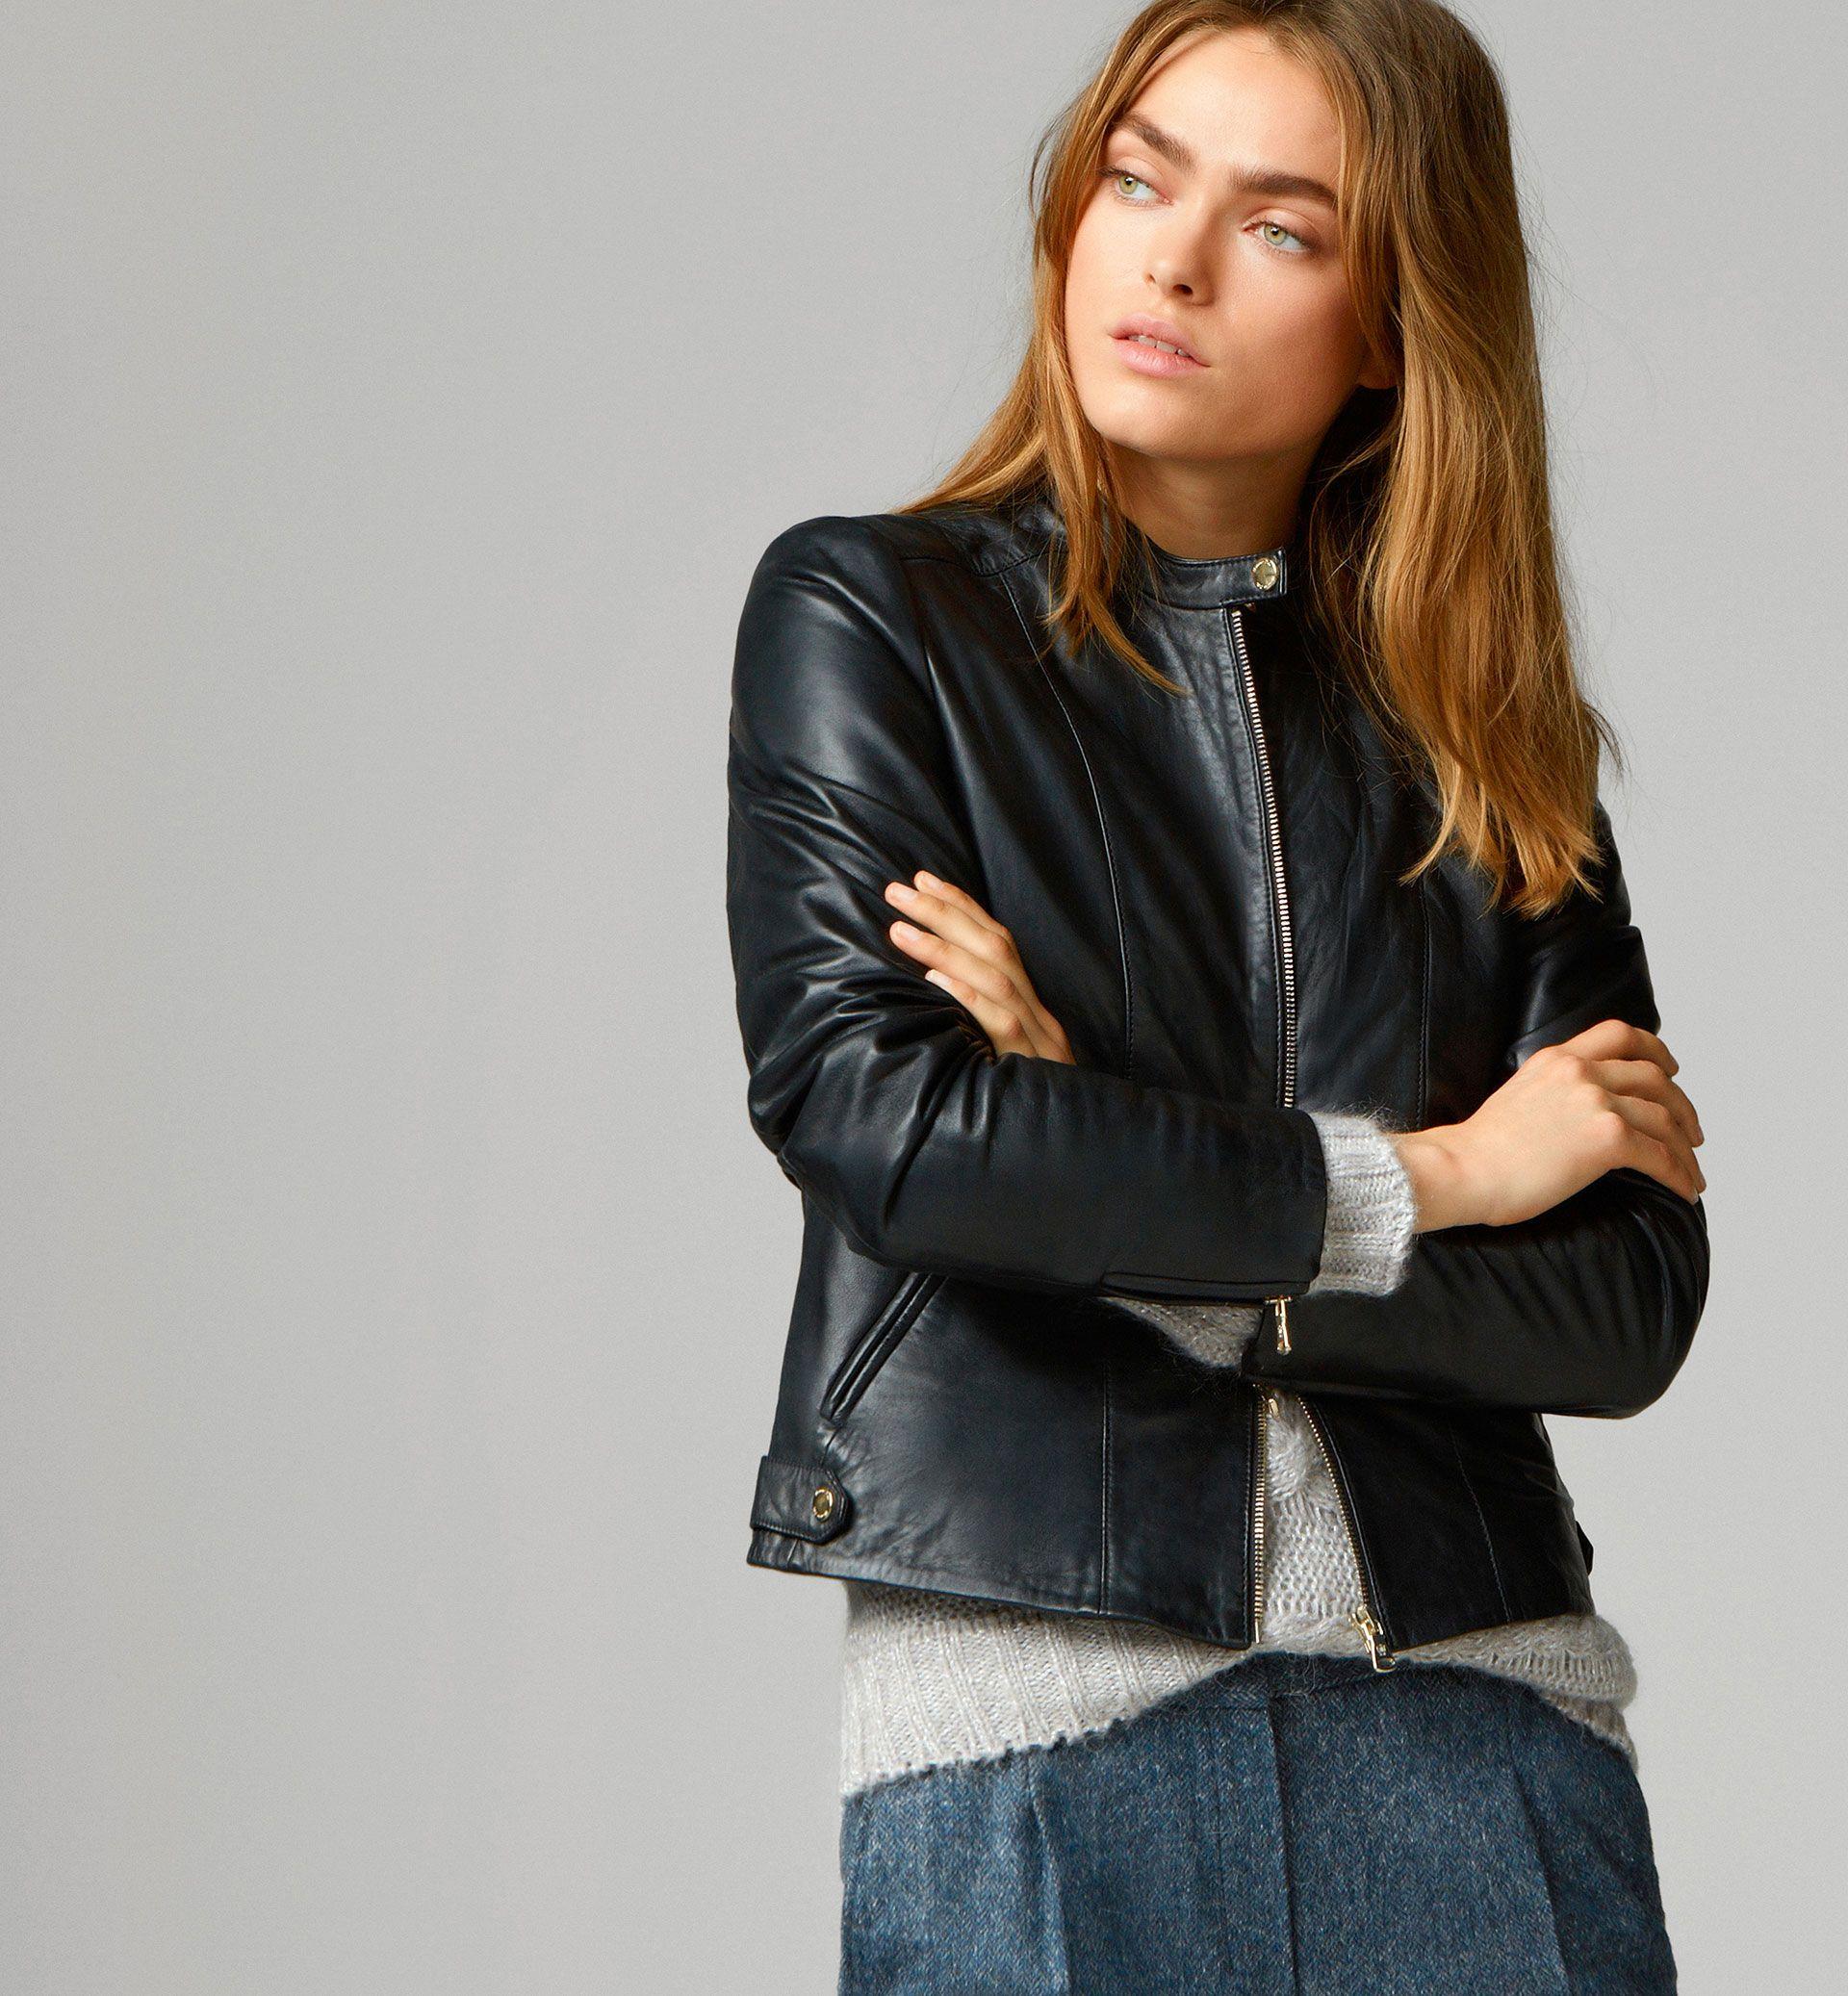 cbabd6d10de Black jacket - Massimo Dutti